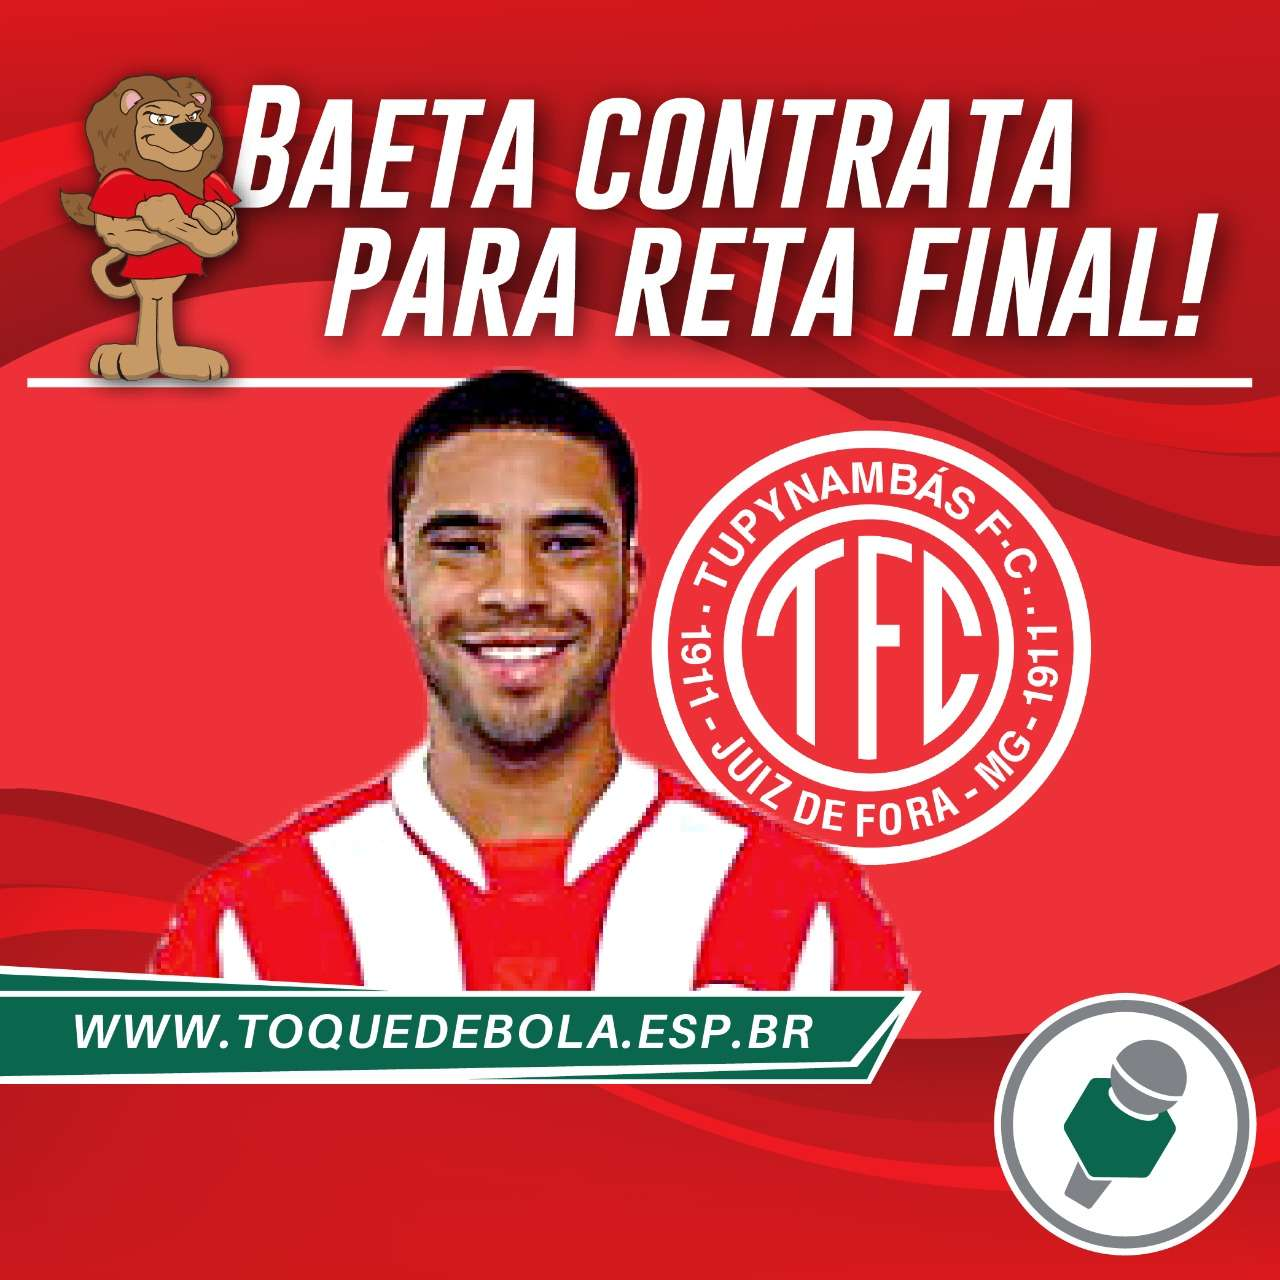 Read more about the article Exclusivo! Após vencer o Gama, Baeta contrata!